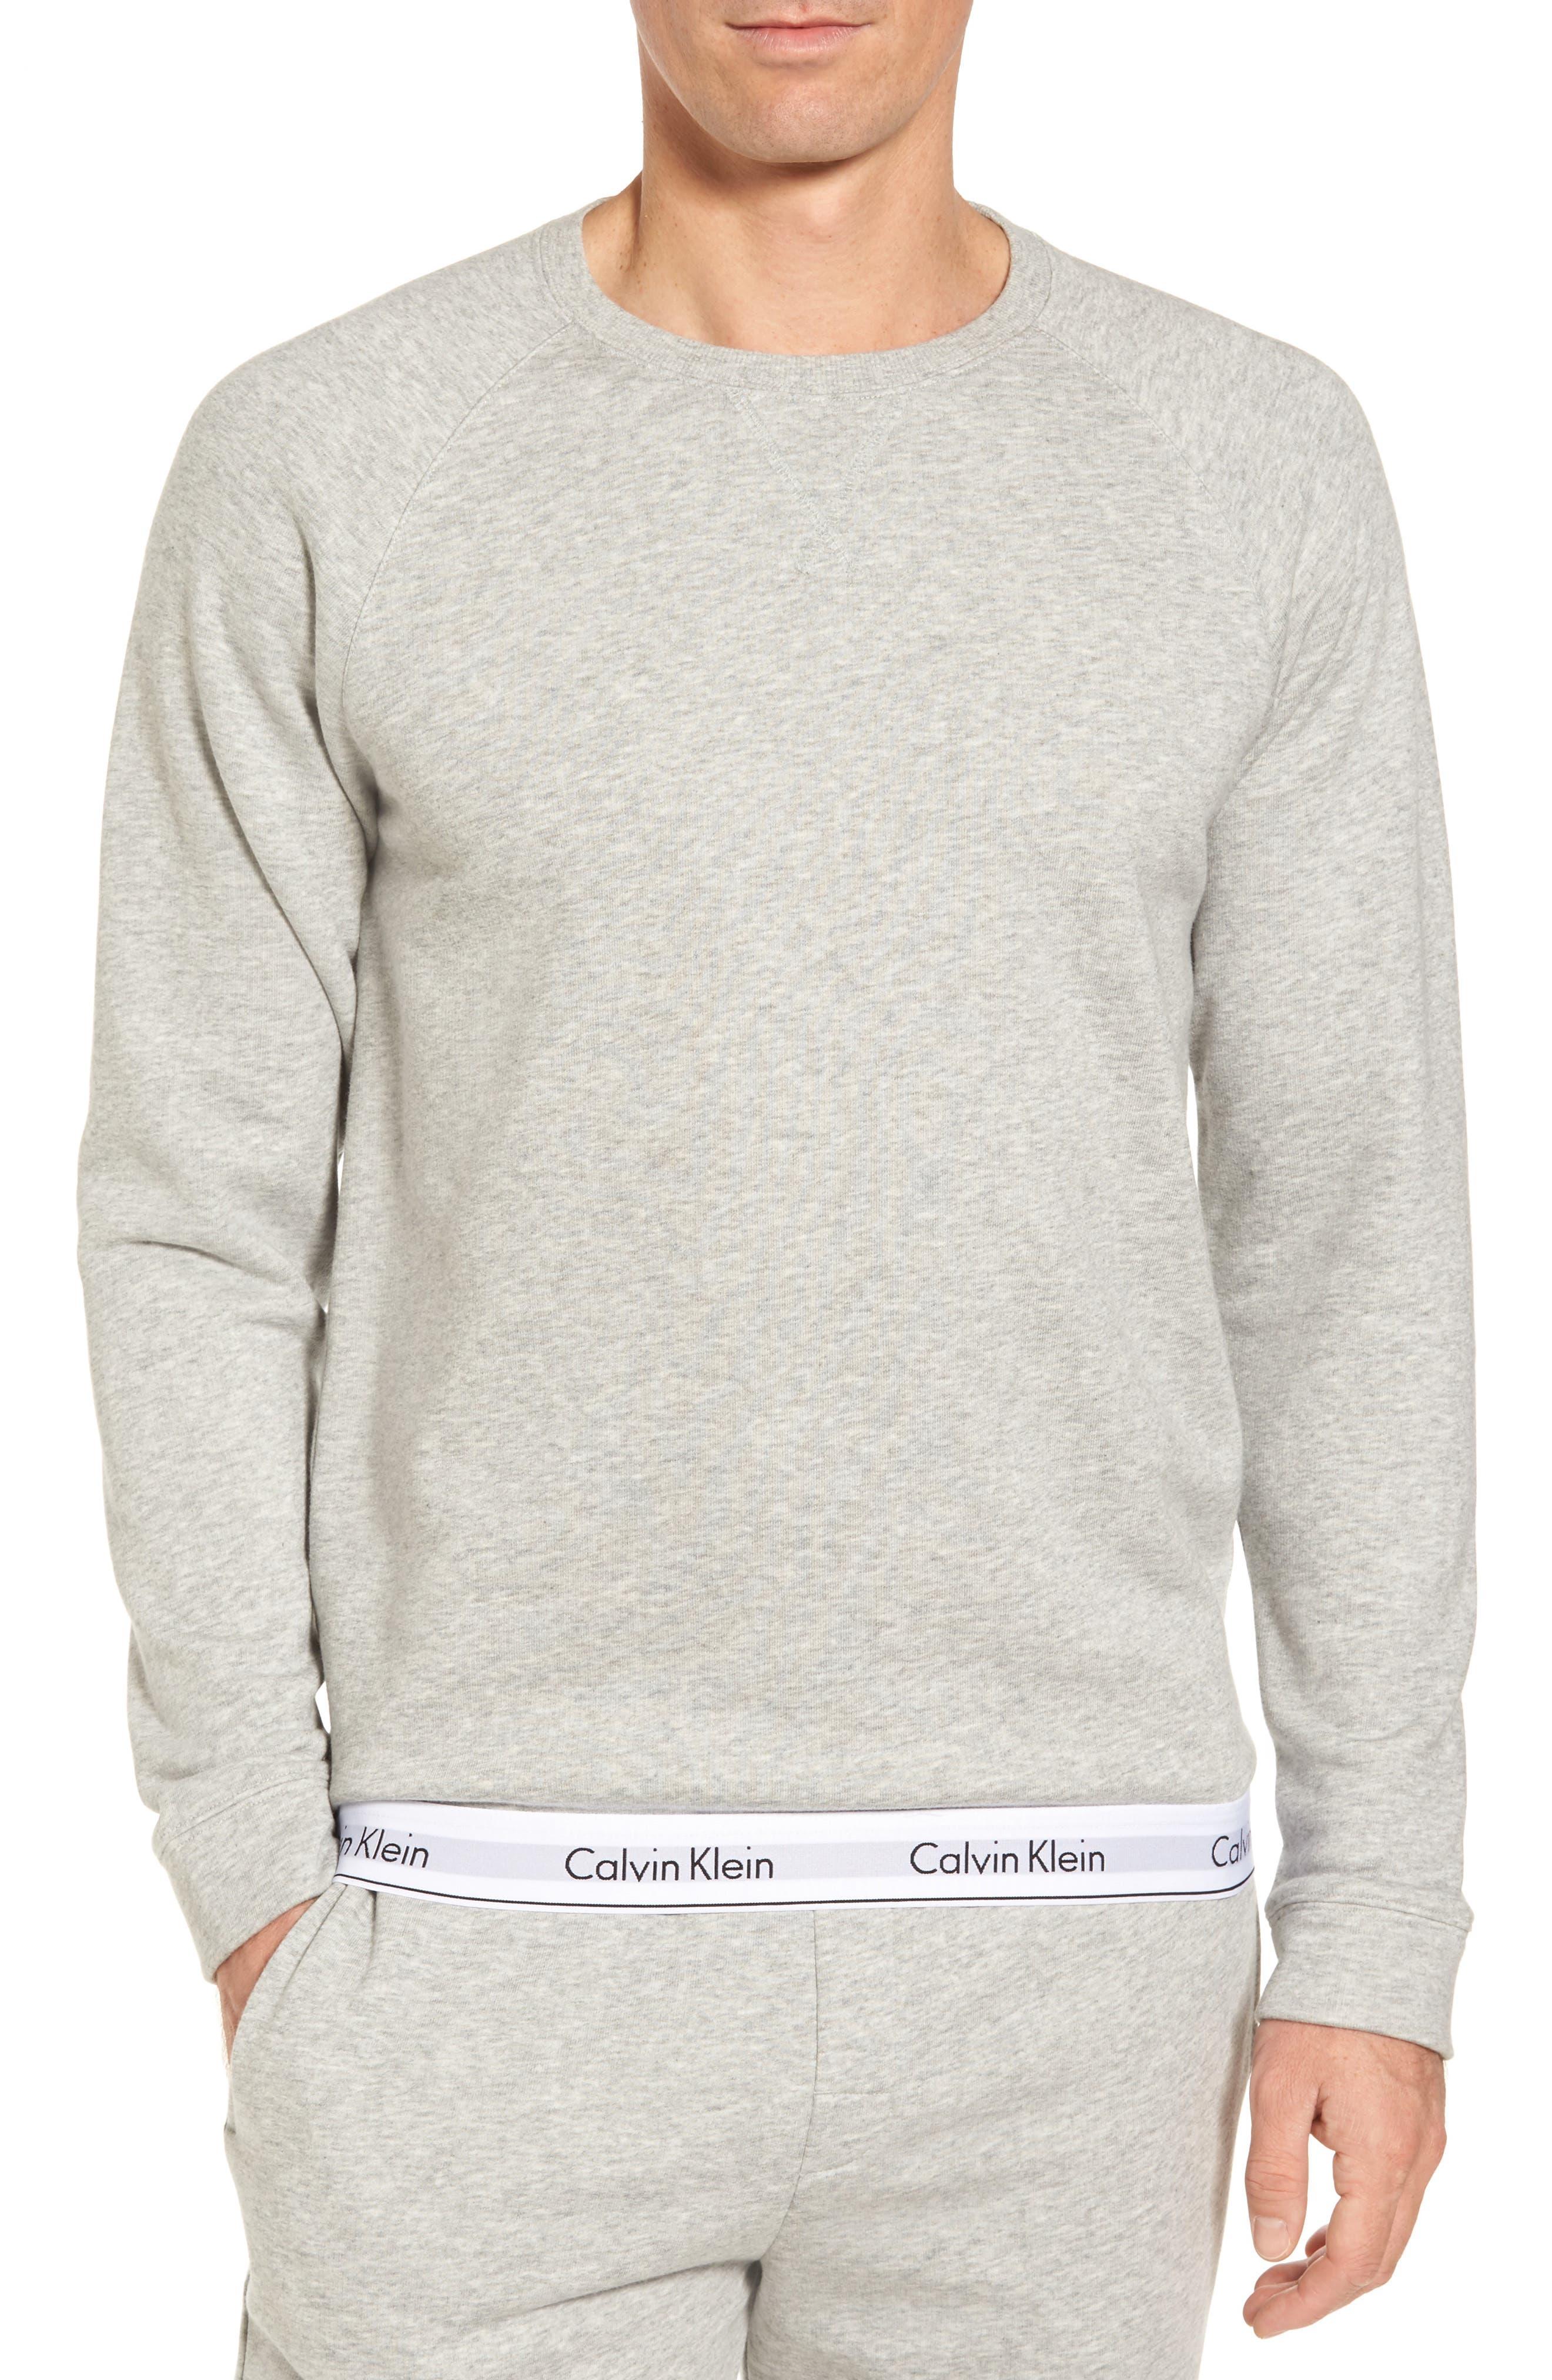 Lounge Crewneck Sweatshirt,                             Main thumbnail 1, color,                             Grey Heather